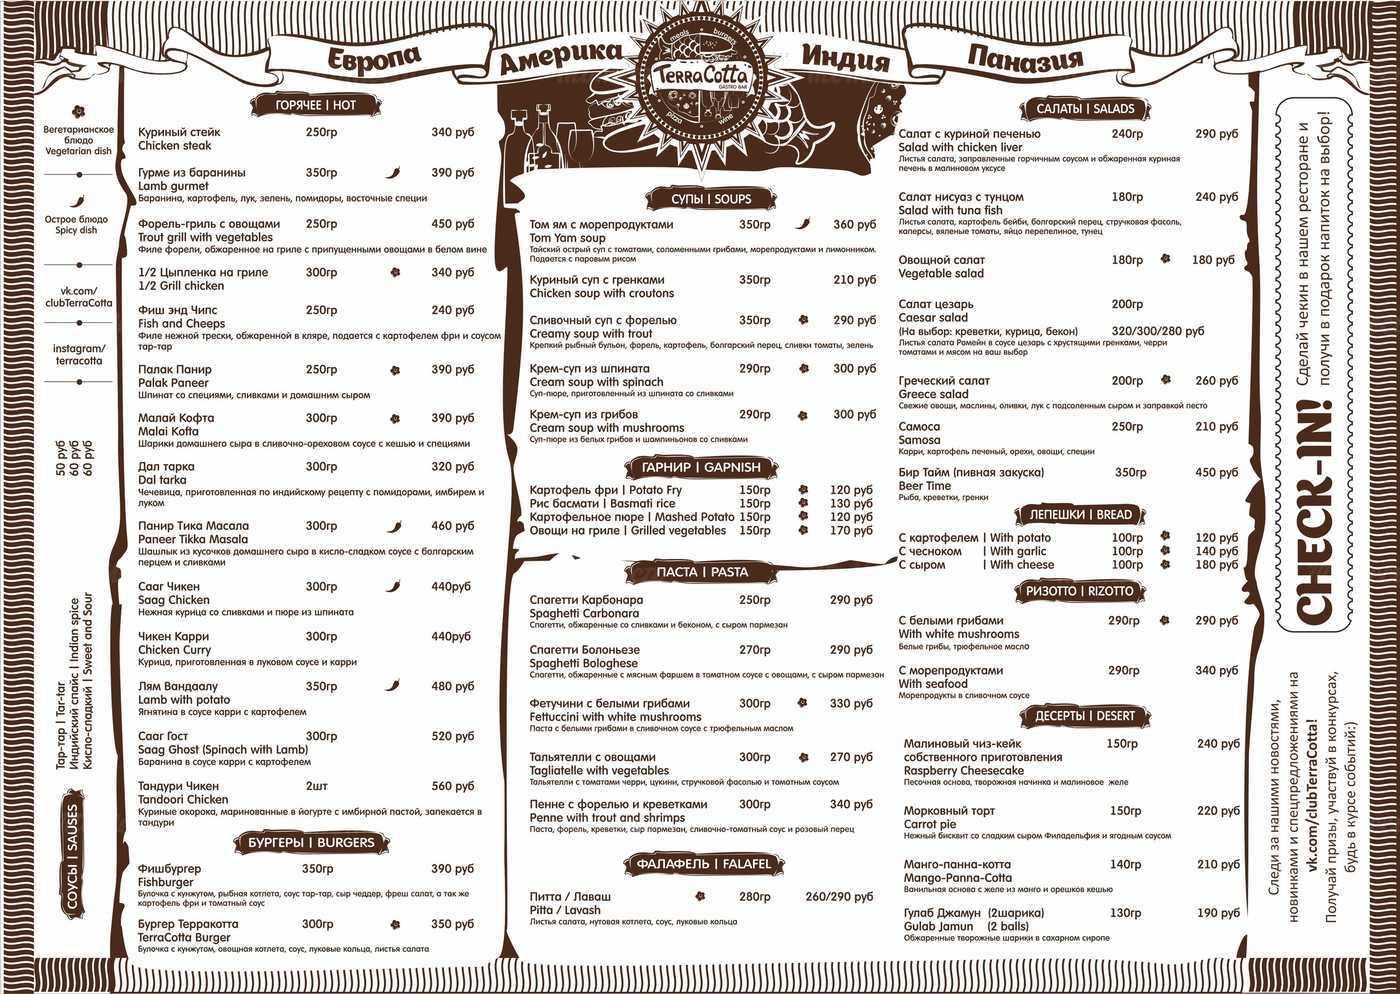 Меню ресторана Terracotta (Терракотта) в Перекупном